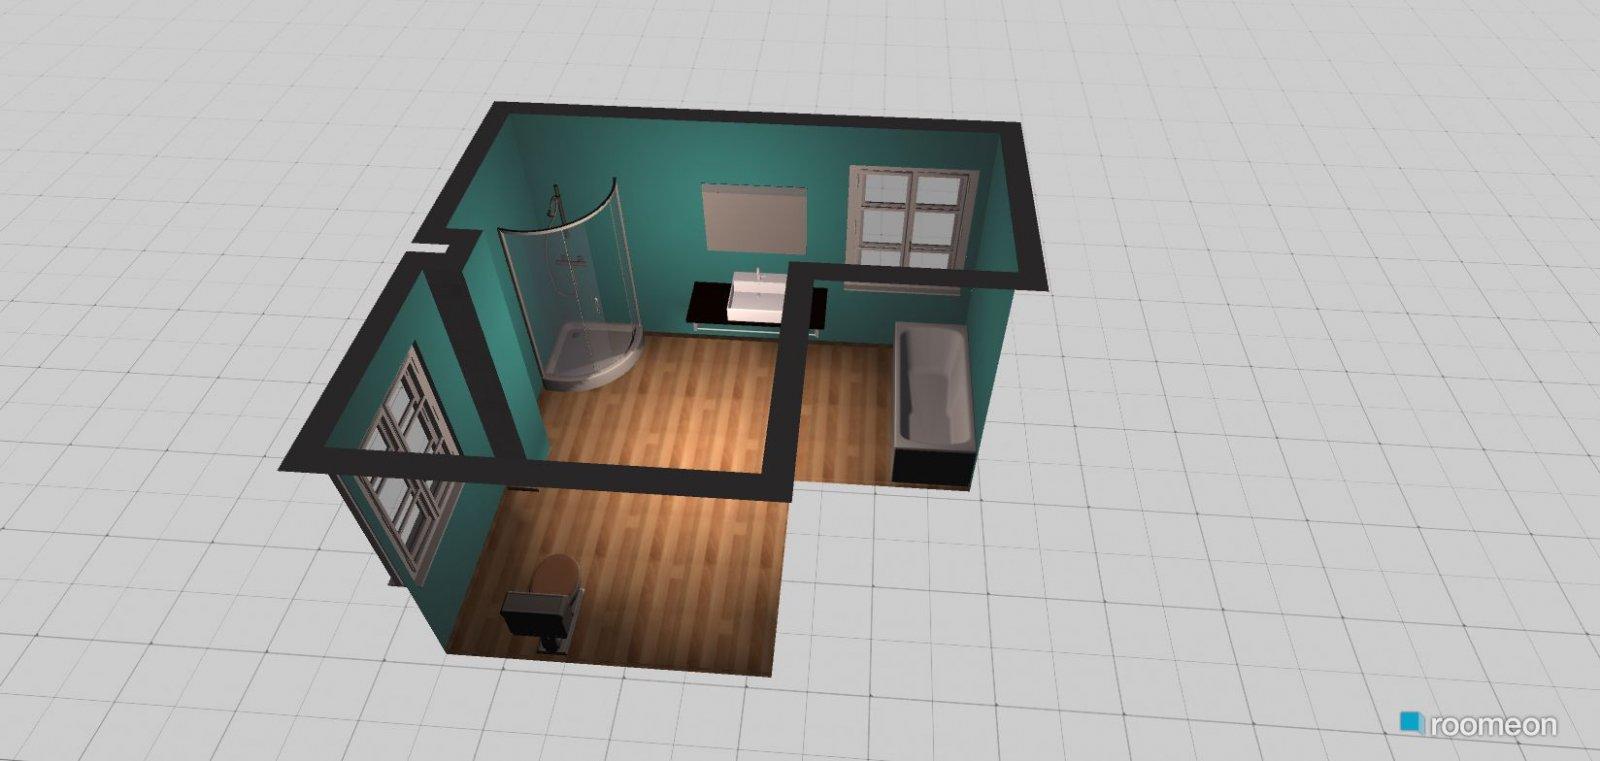 room design badrum roomeon community. Black Bedroom Furniture Sets. Home Design Ideas